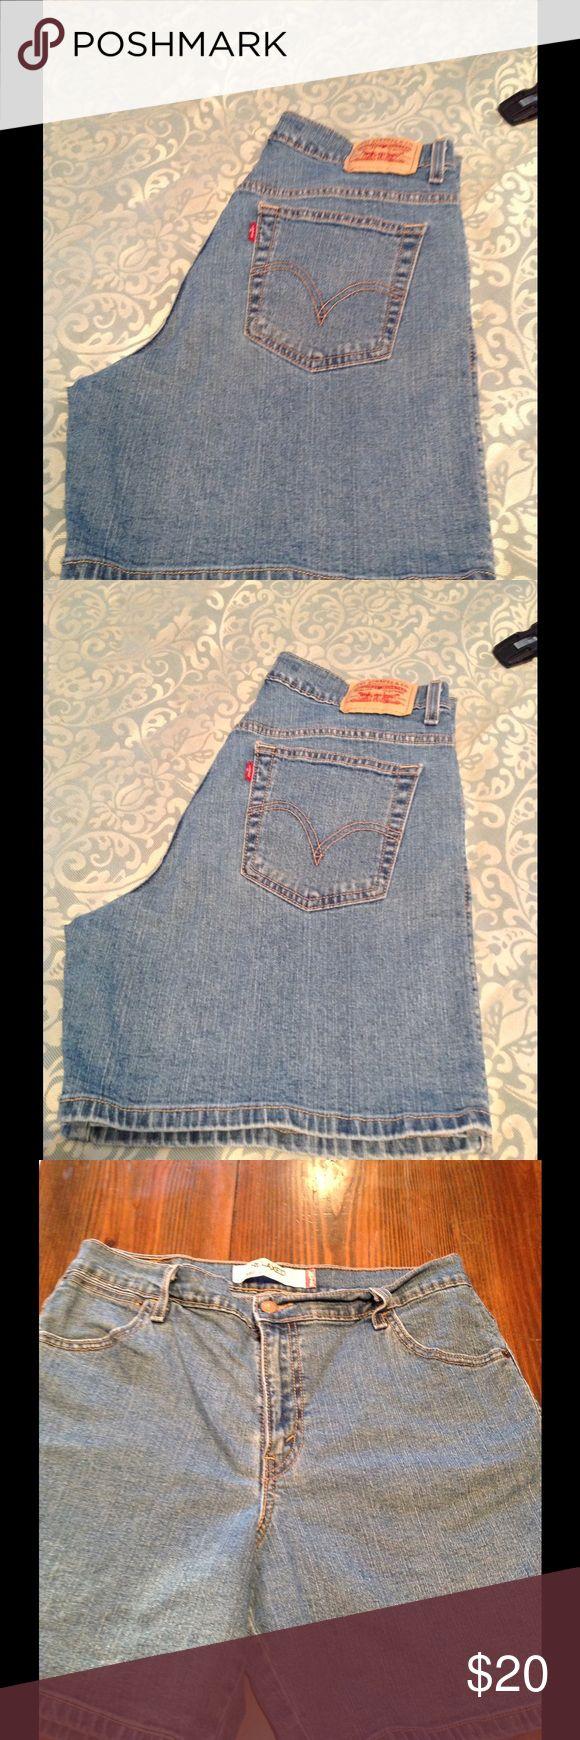 "Levi's women's jean shorts 550 Relaxed fit women's Levi's shorts. With 6"" inseam Levis Shorts Jean Shorts"